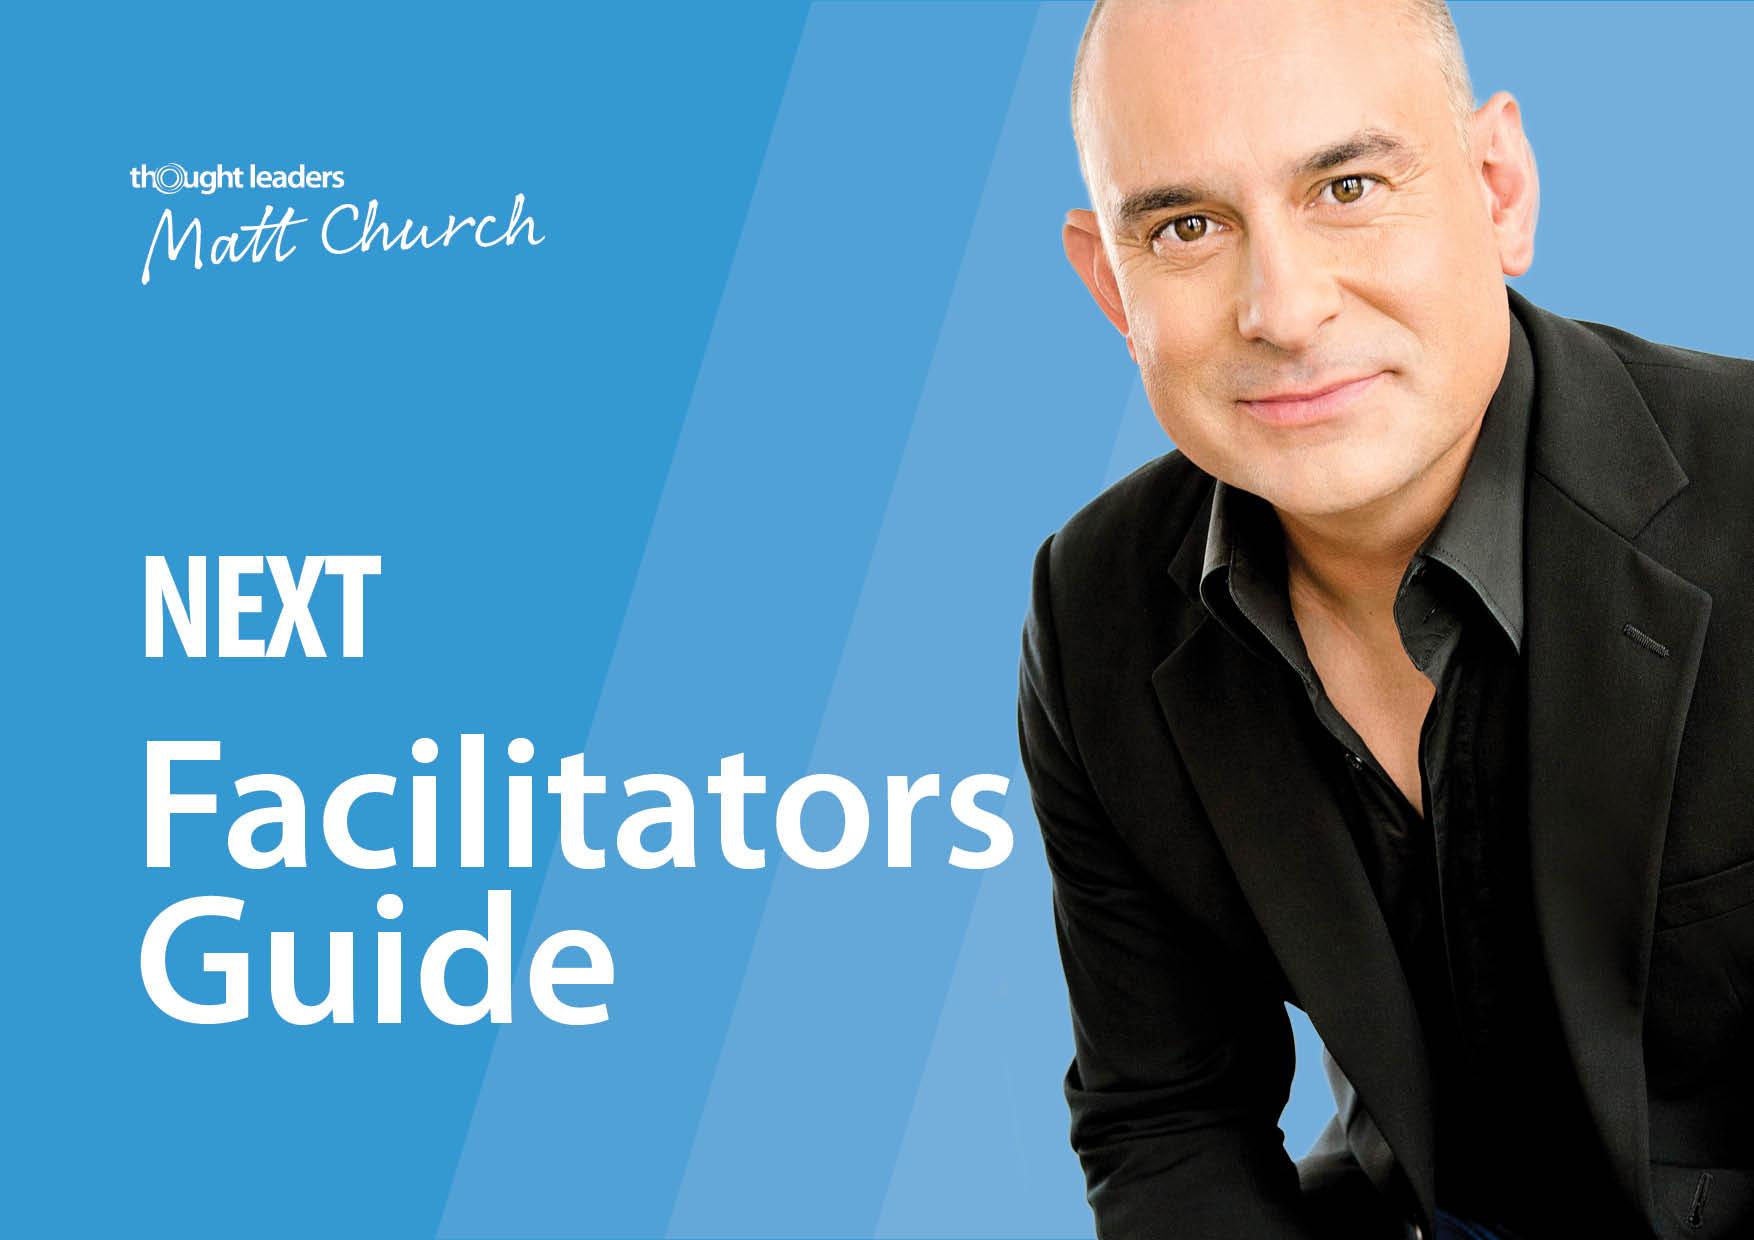 Next Facilitators Guide.jpg